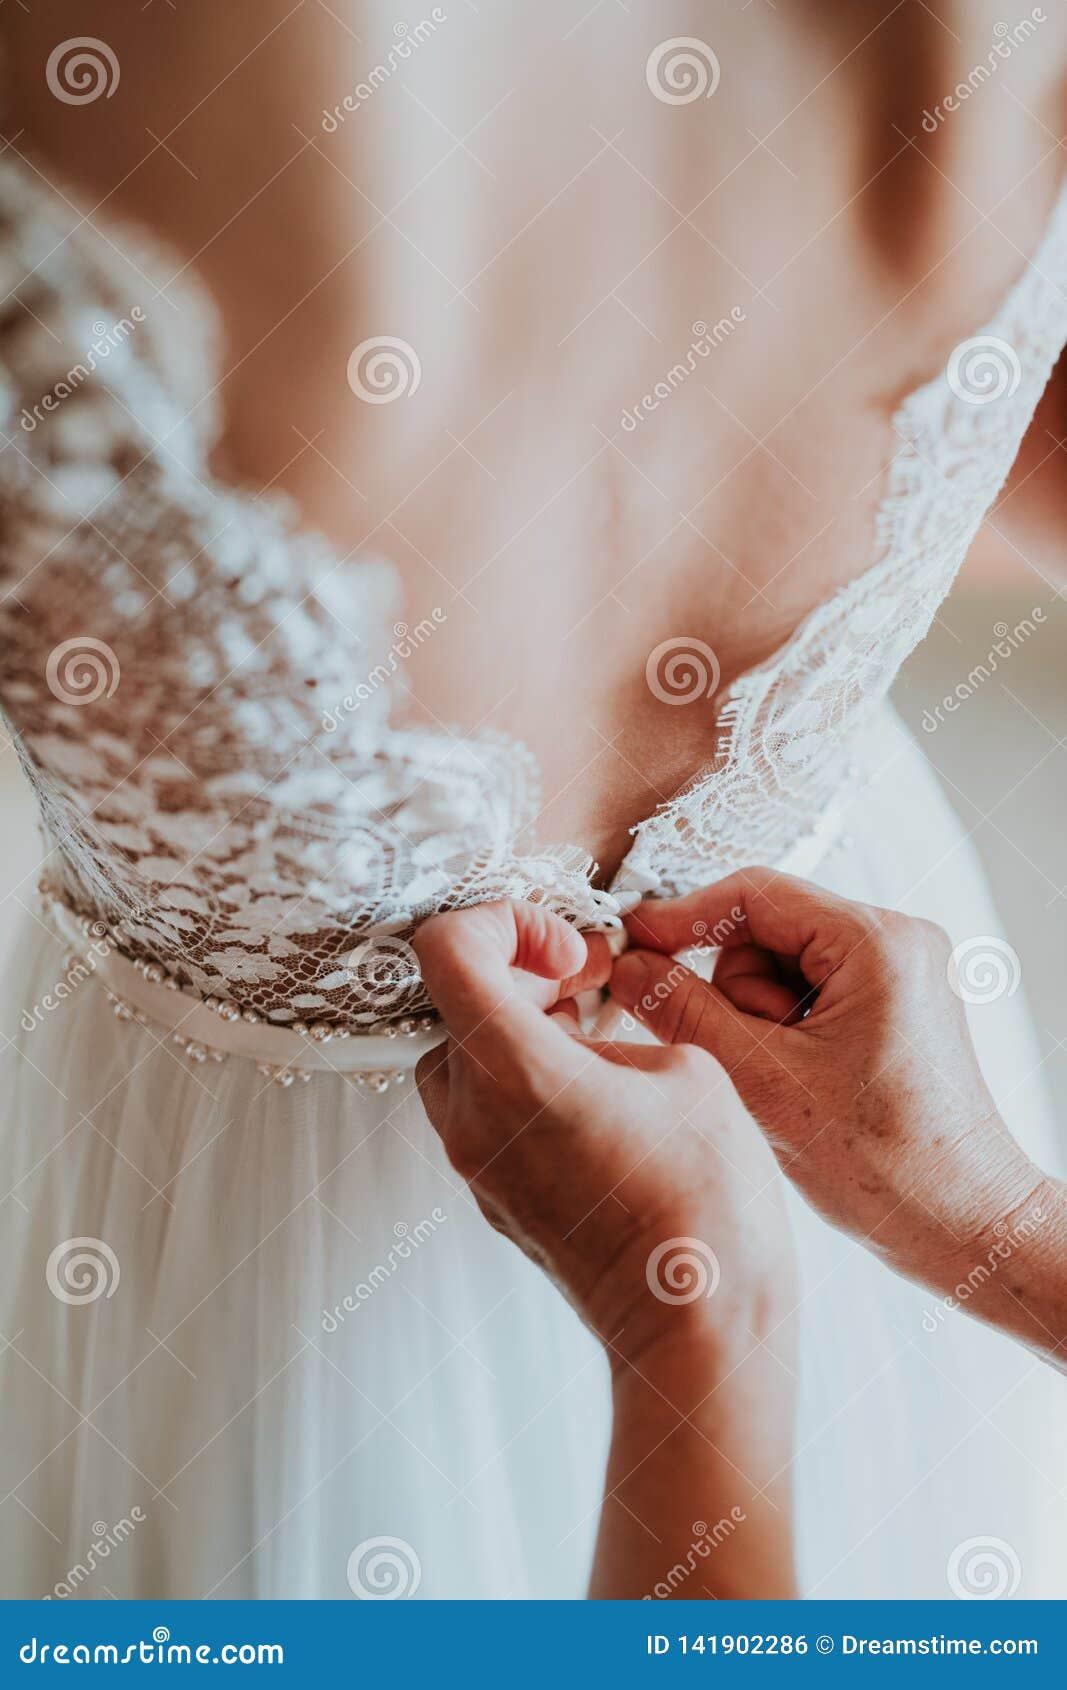 Bride is getting dressed up